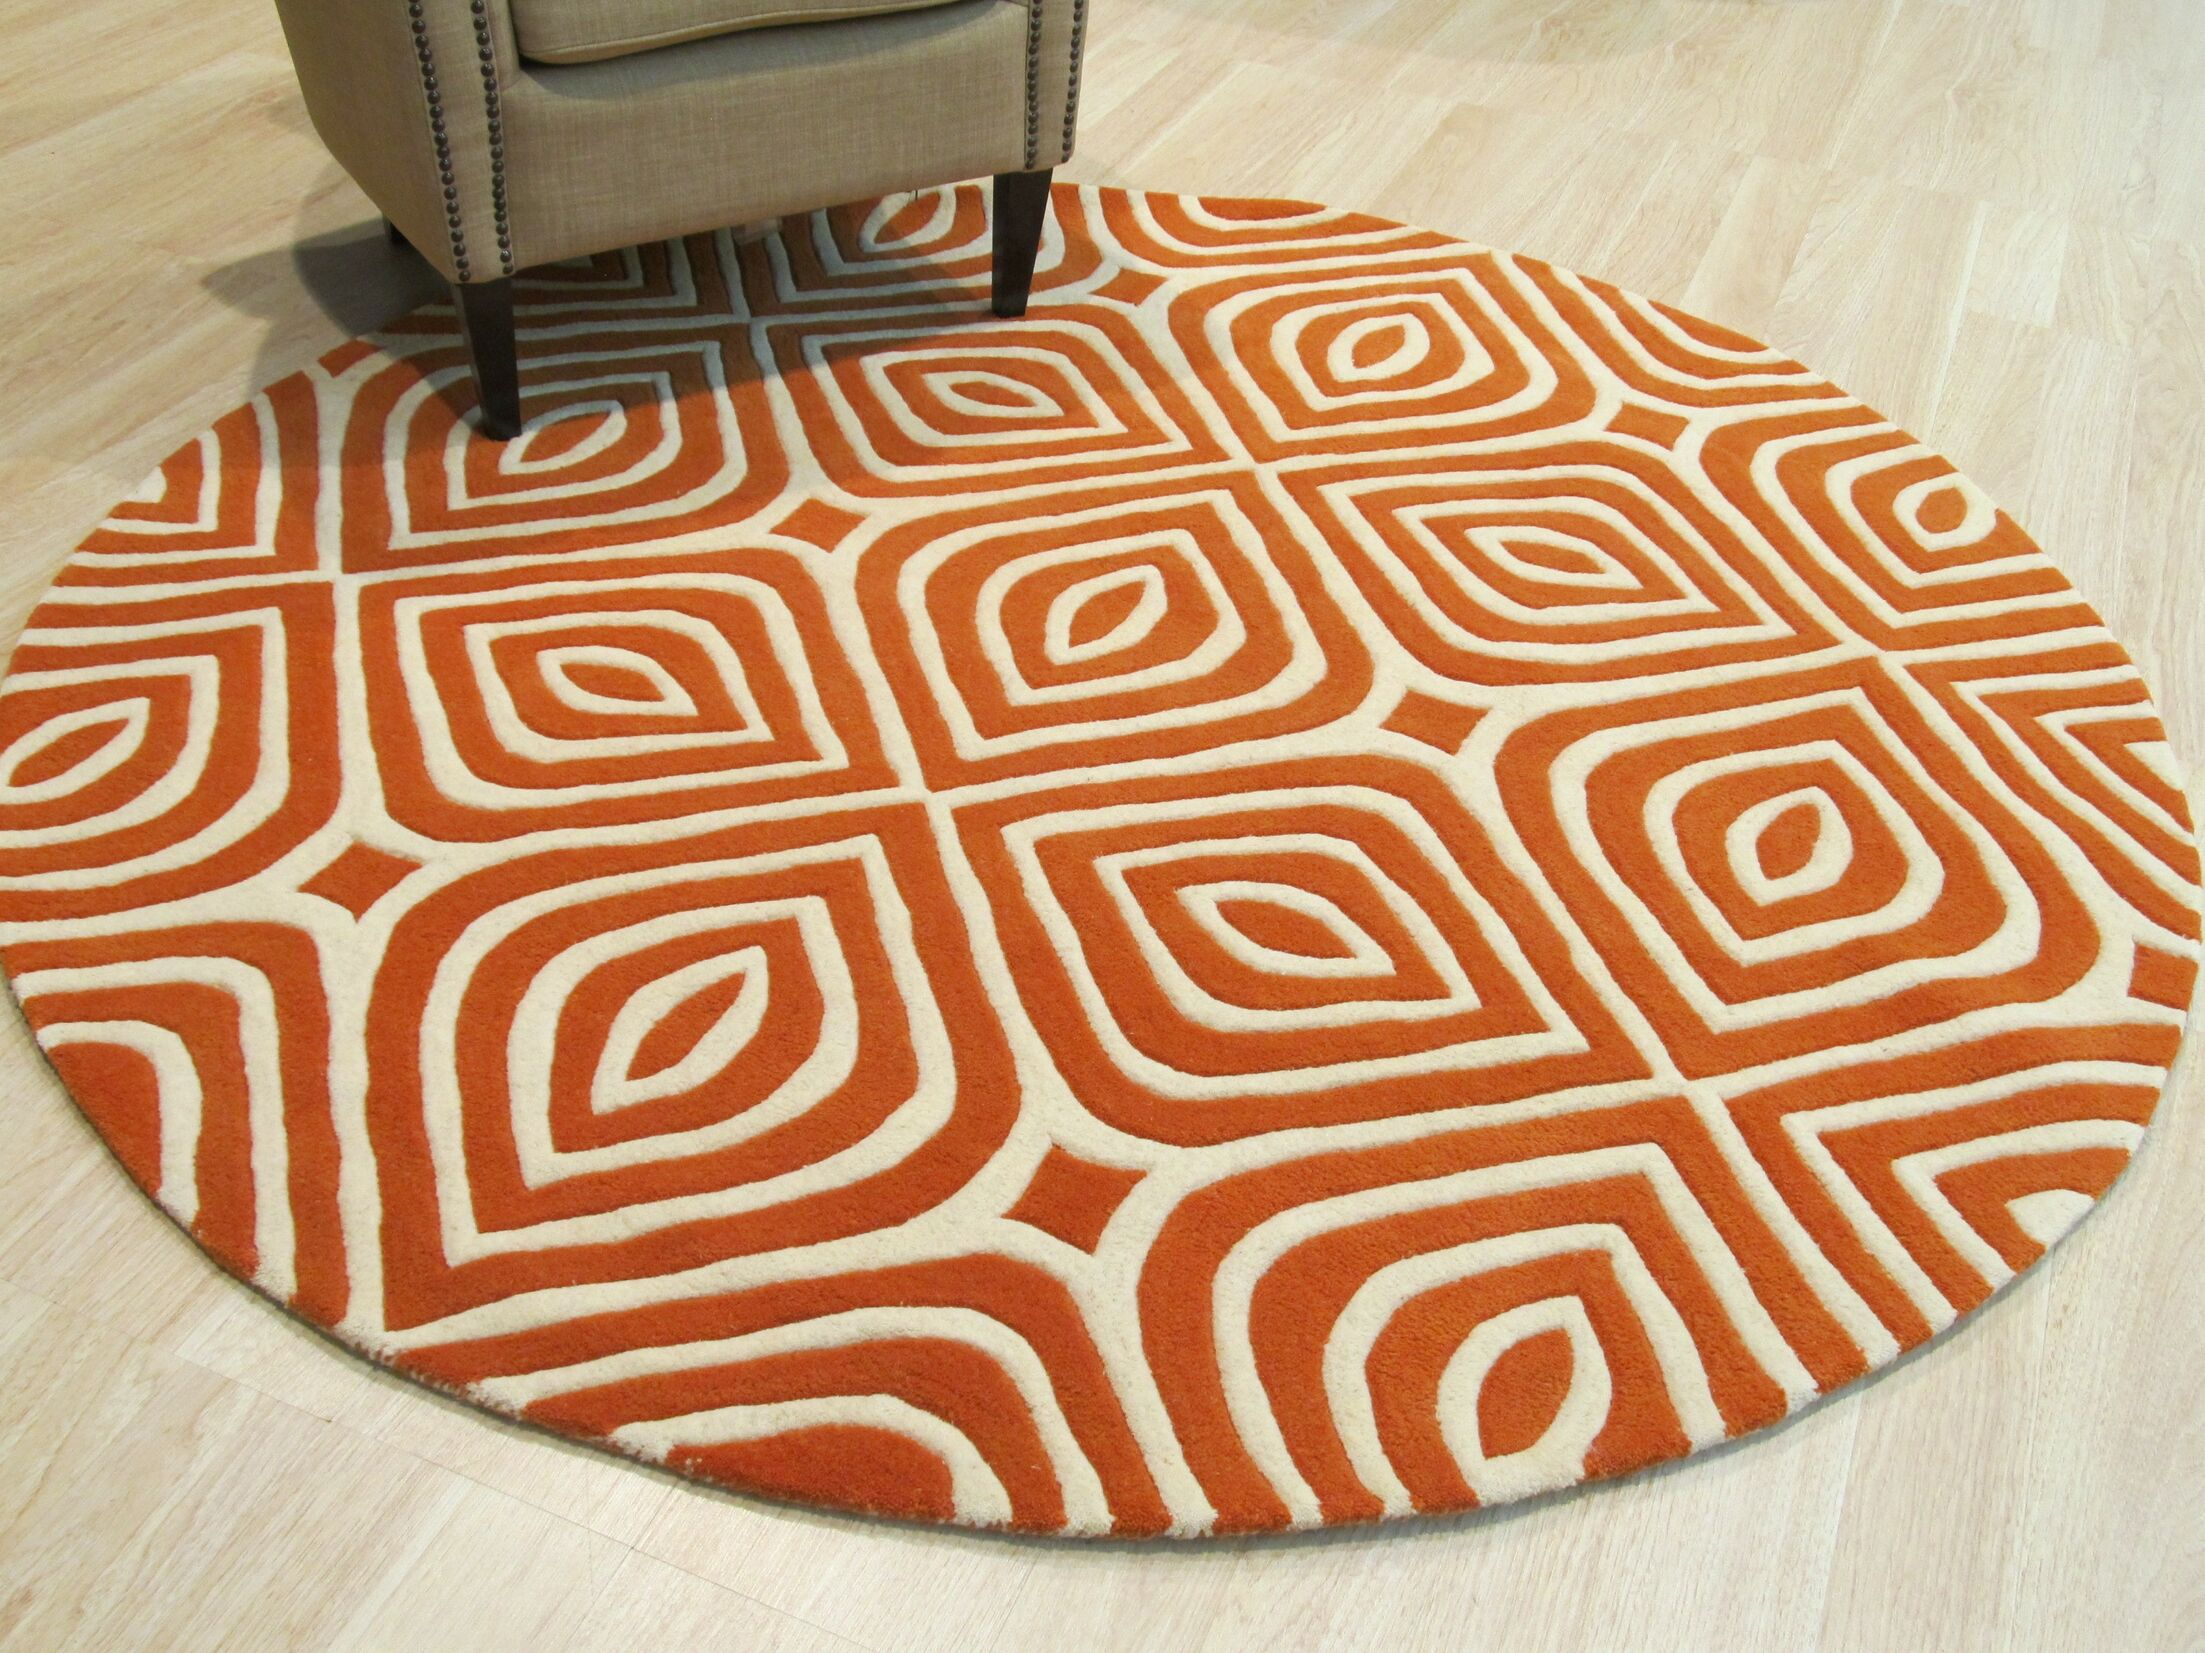 Corrigan Hand-Tufted Wool Orange Area Rug Rug Size: Round 6'